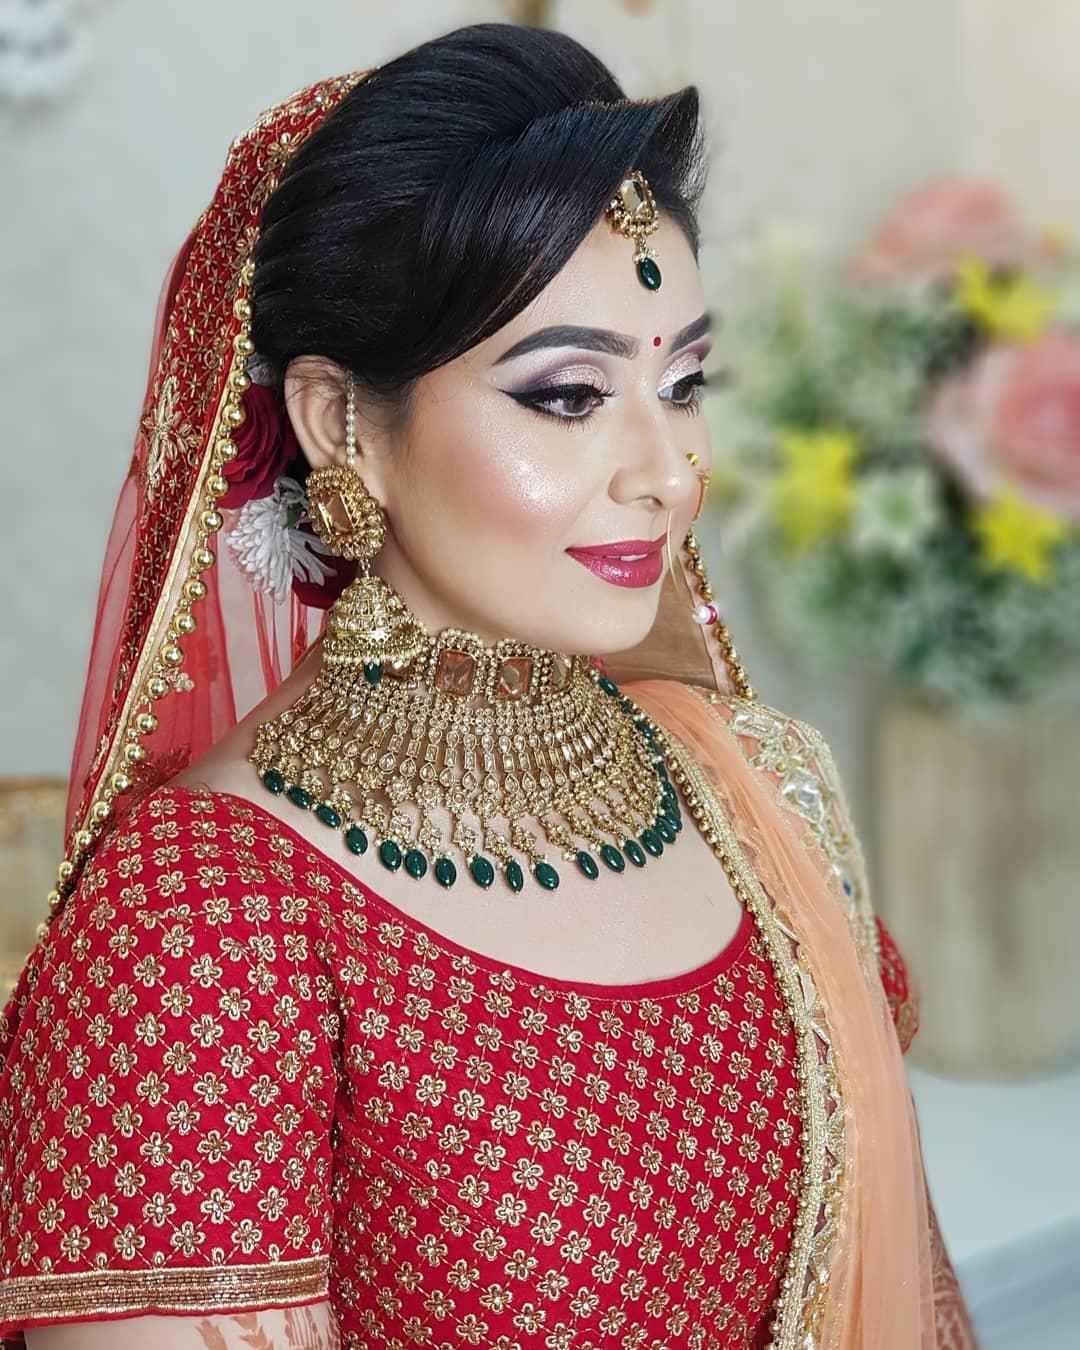 indian wedding makeup ideas to look like celebs - k4 fashion